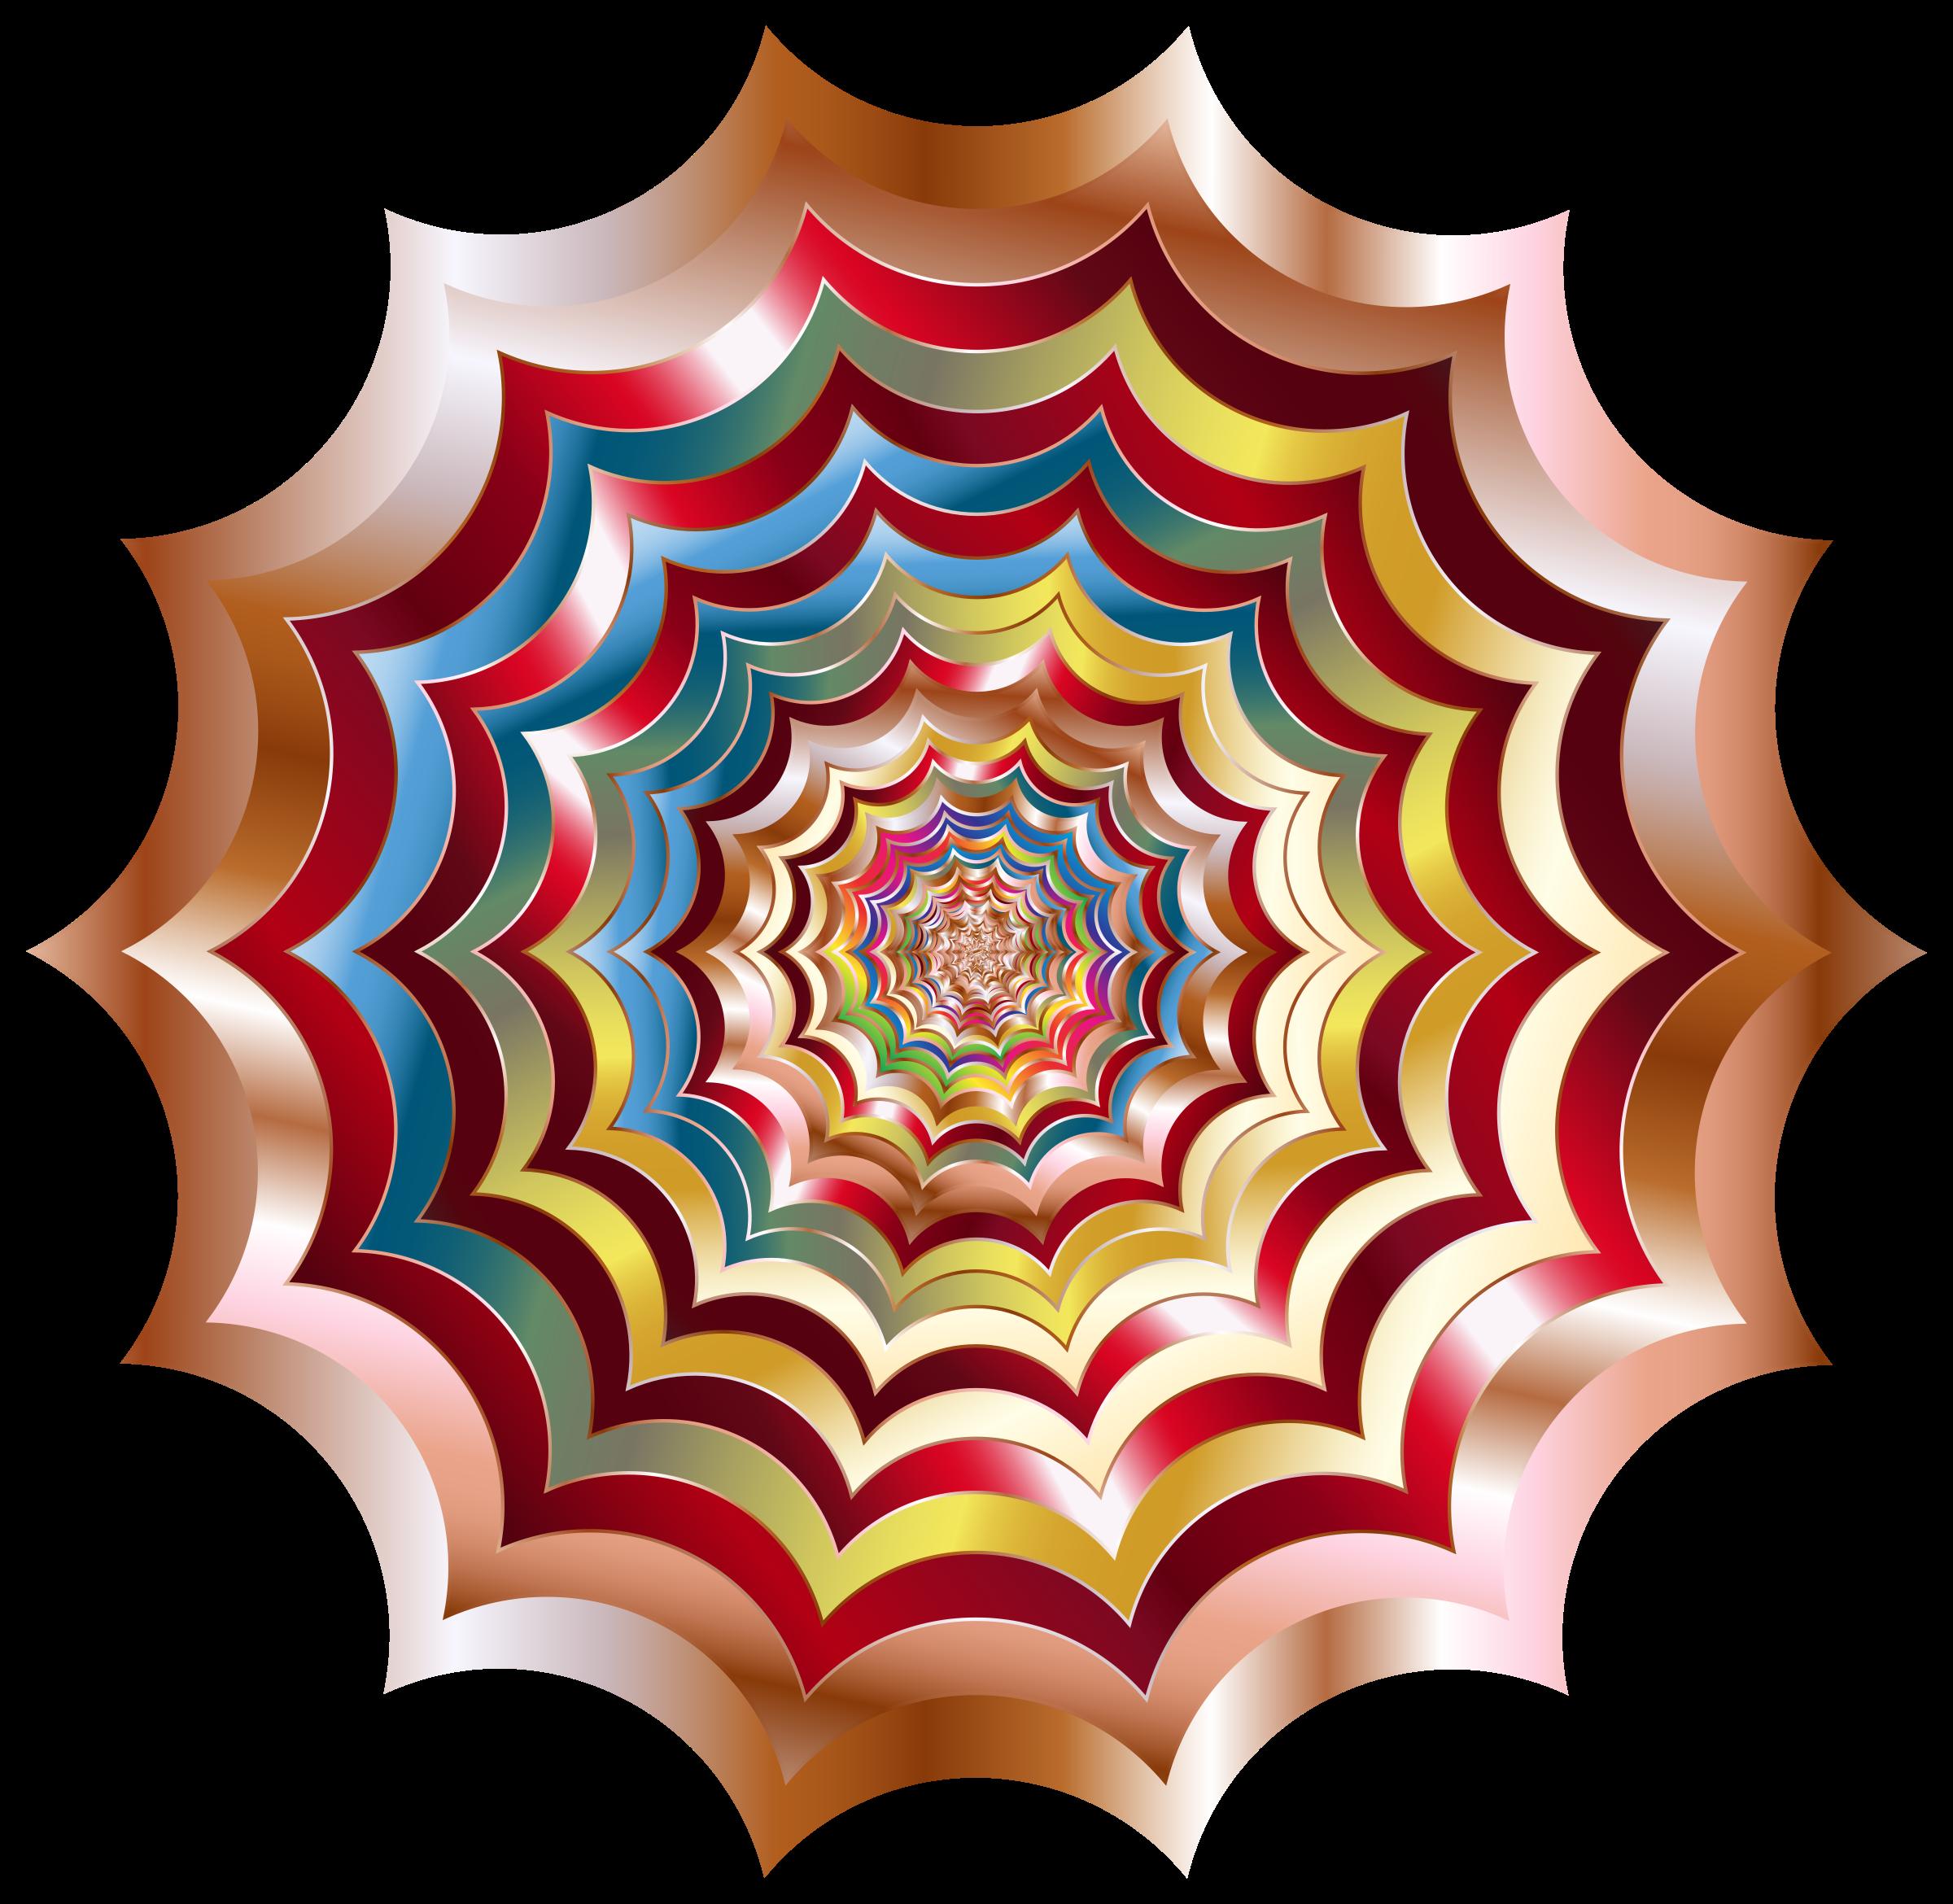 Hypnotic clipart Revitalized Spider 7 Web Web